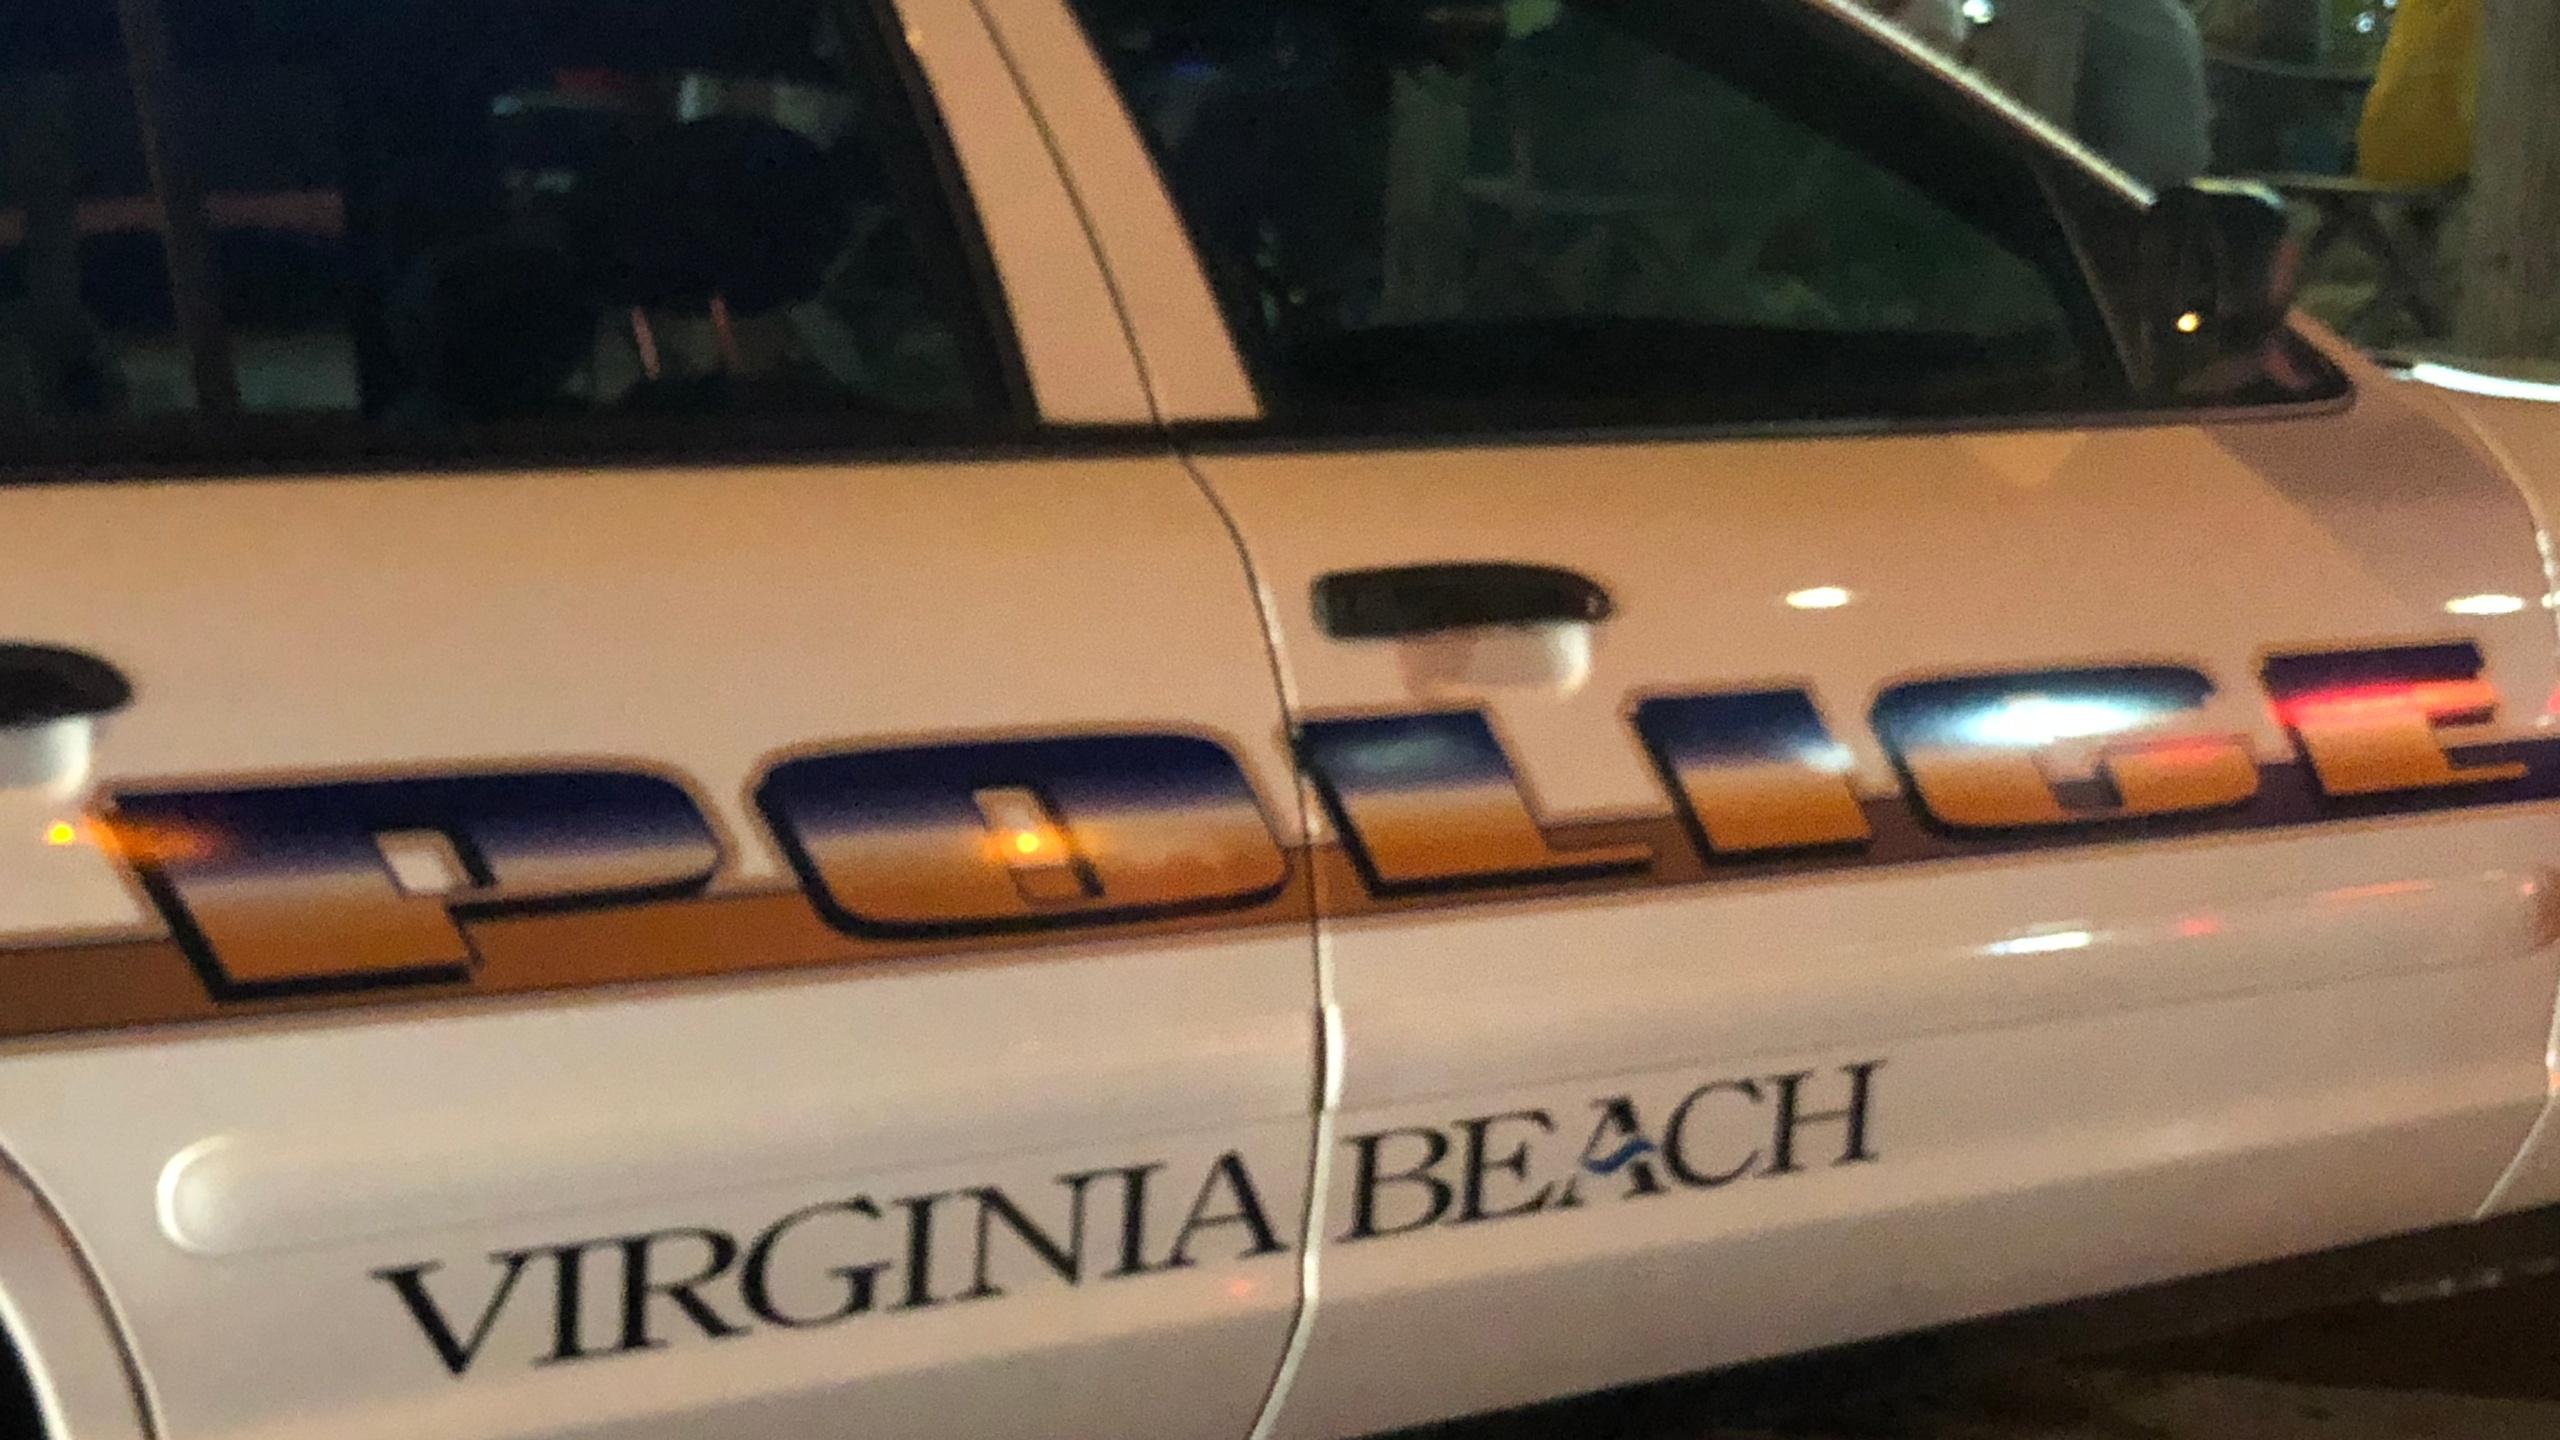 Virginia Beach Police Generic